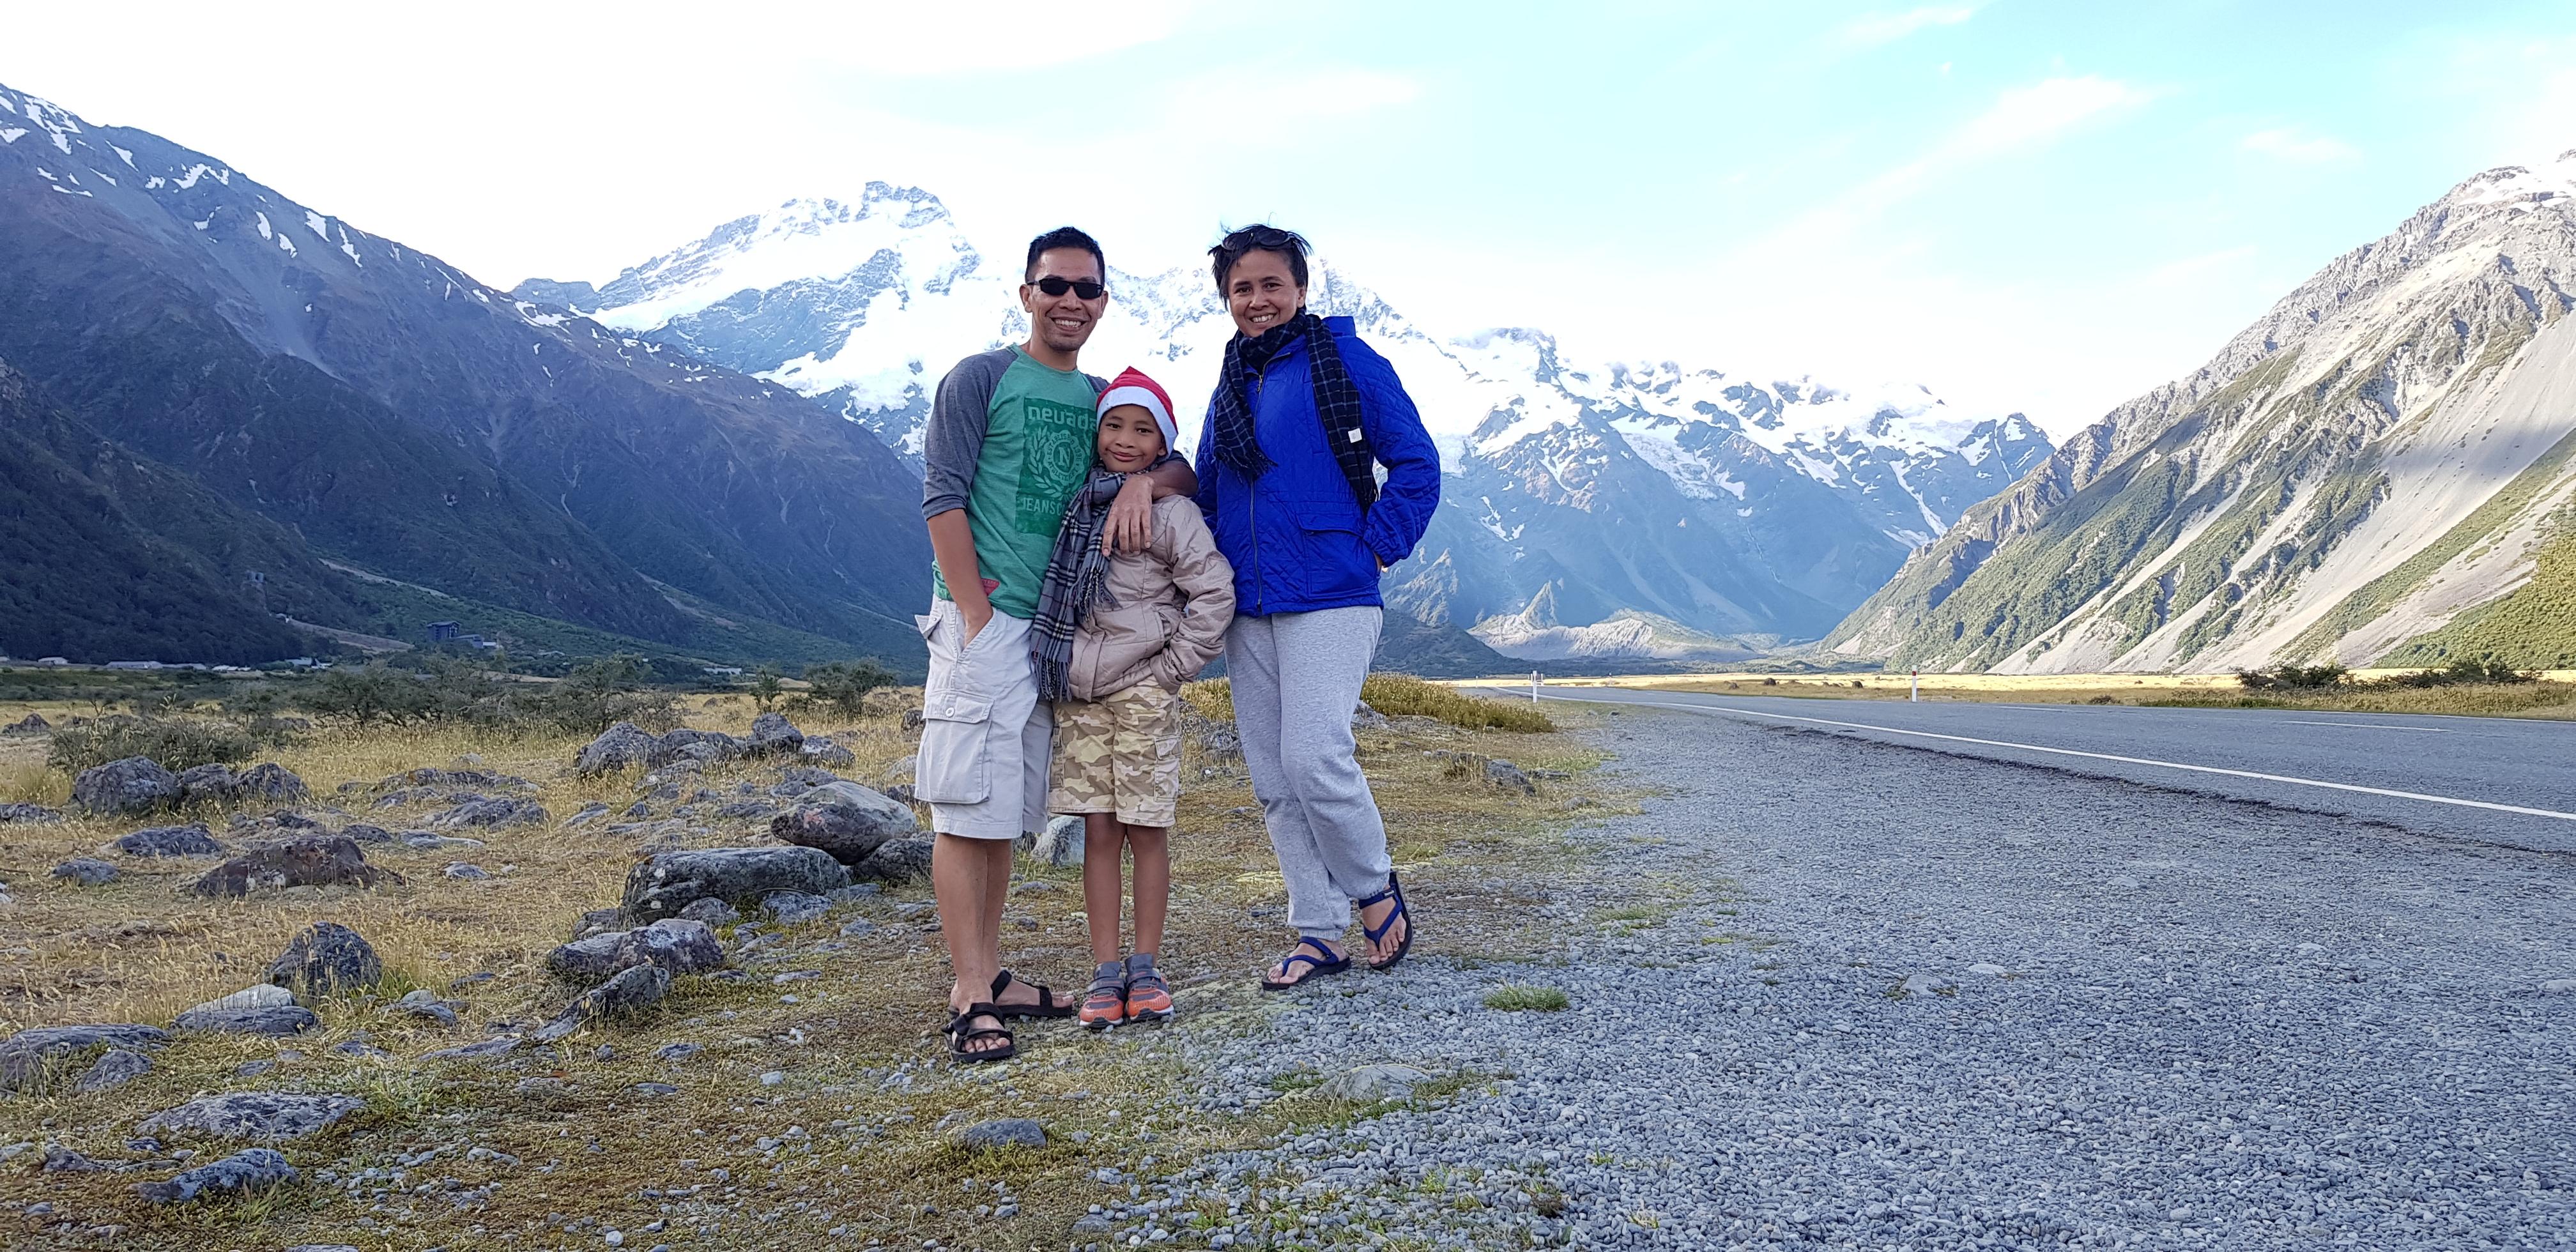 Jalan-jalan ke New Zealand – Aku Tak Akan Menyerah